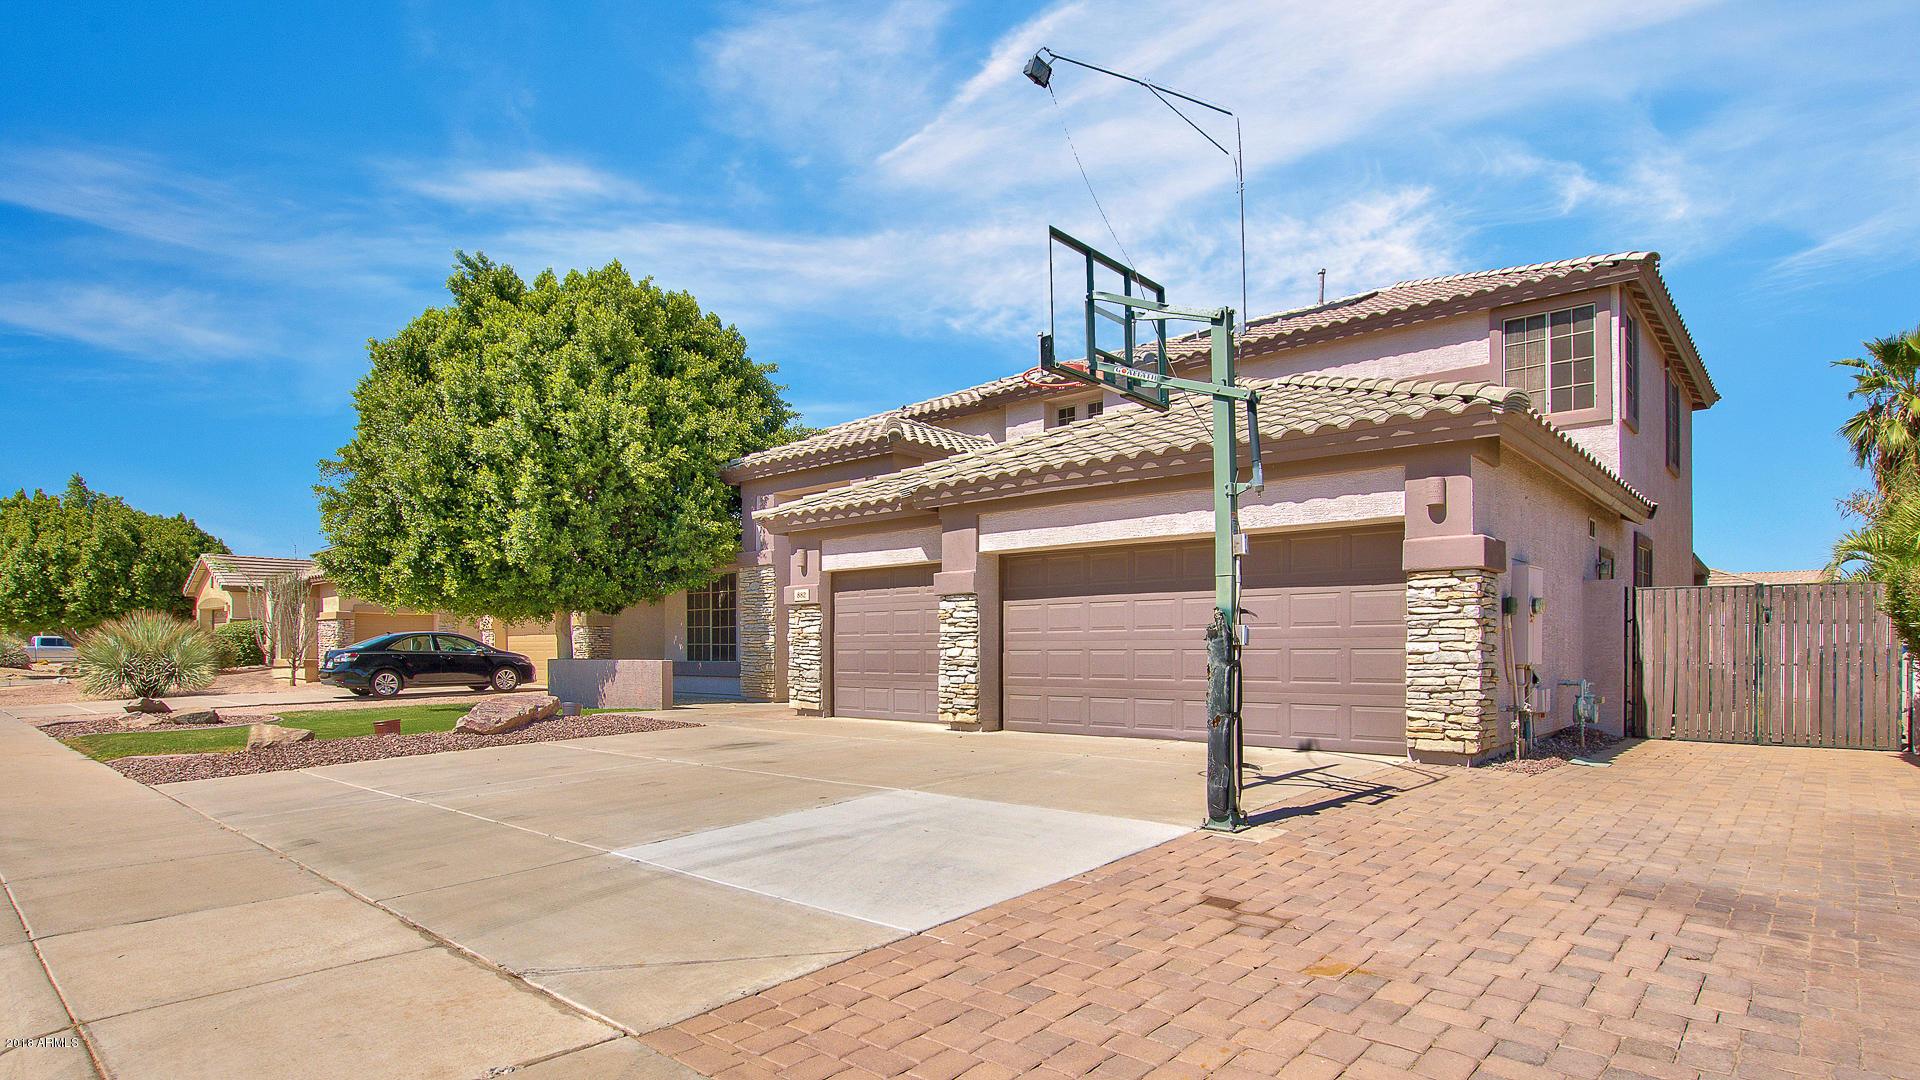 882 E TOLEDO Street Gilbert, AZ 85295 - MLS #: 5826291